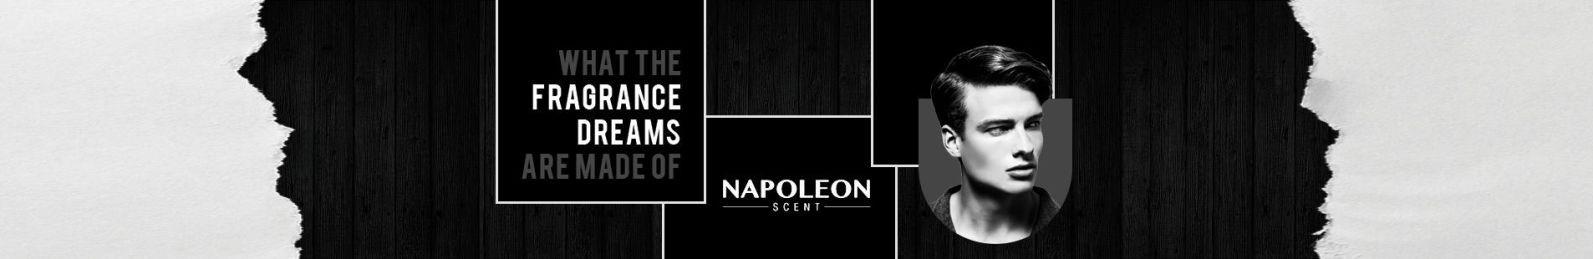 Napoleon Perfume